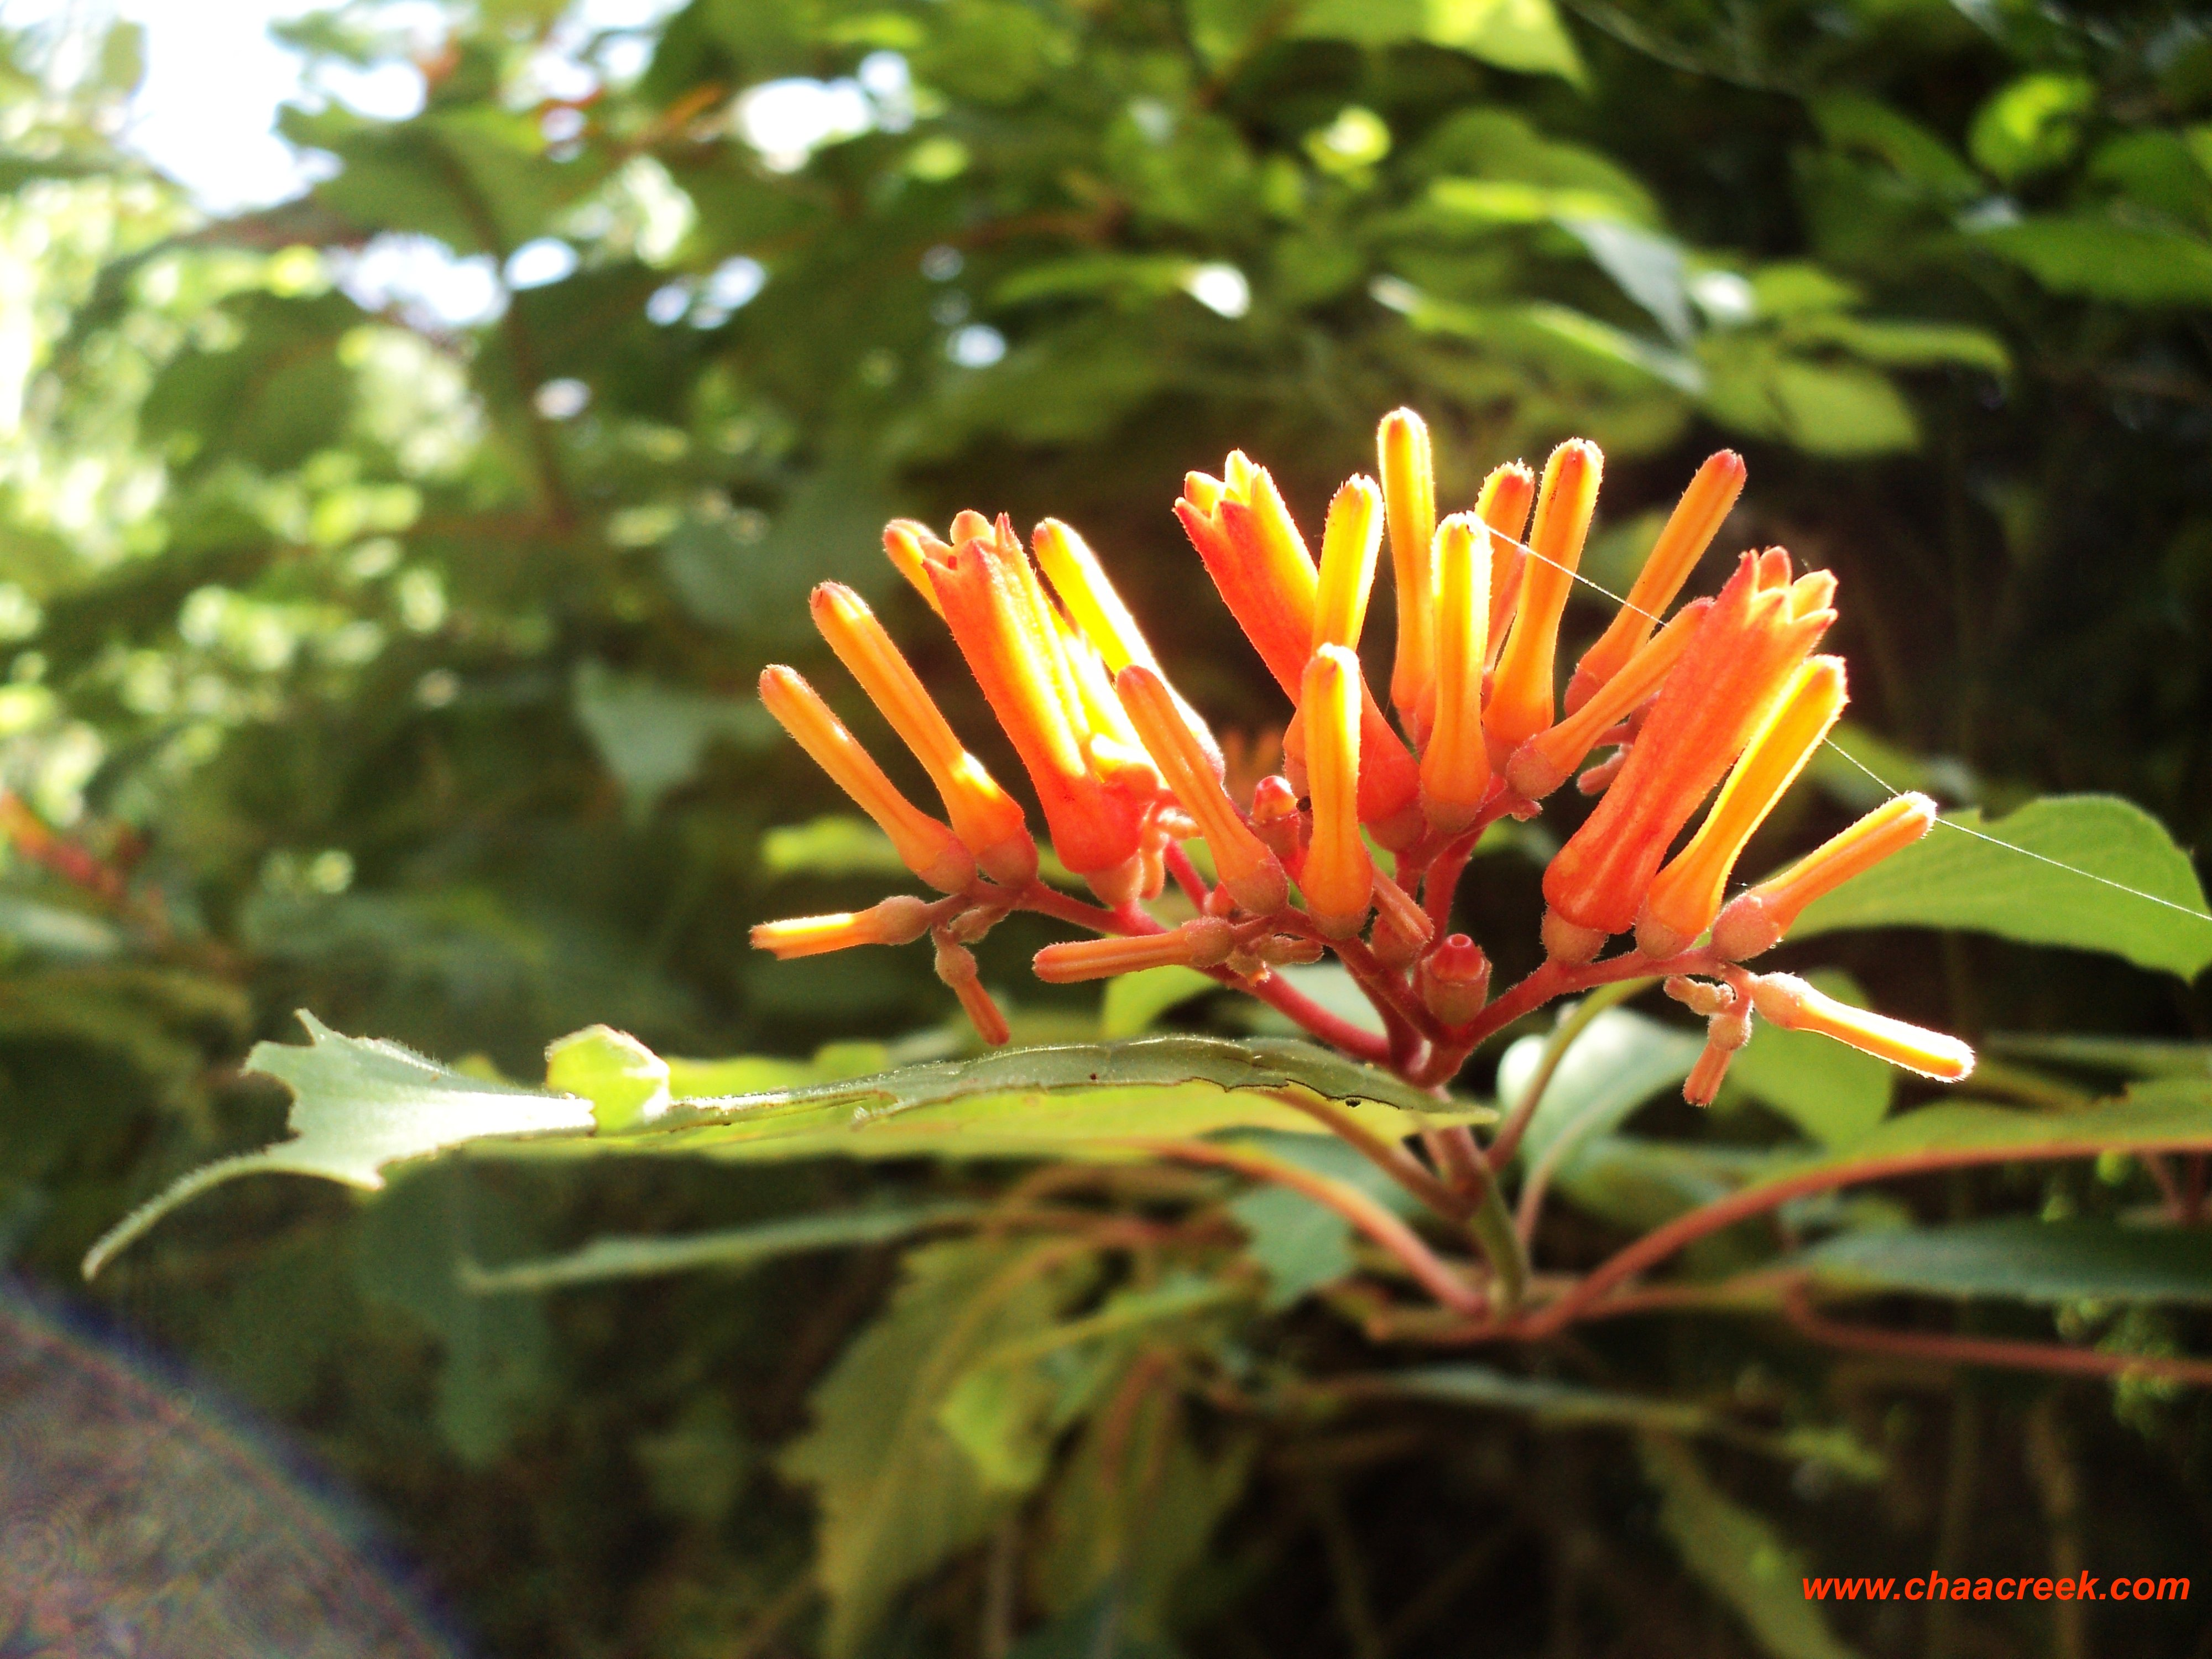 plantsofbelize